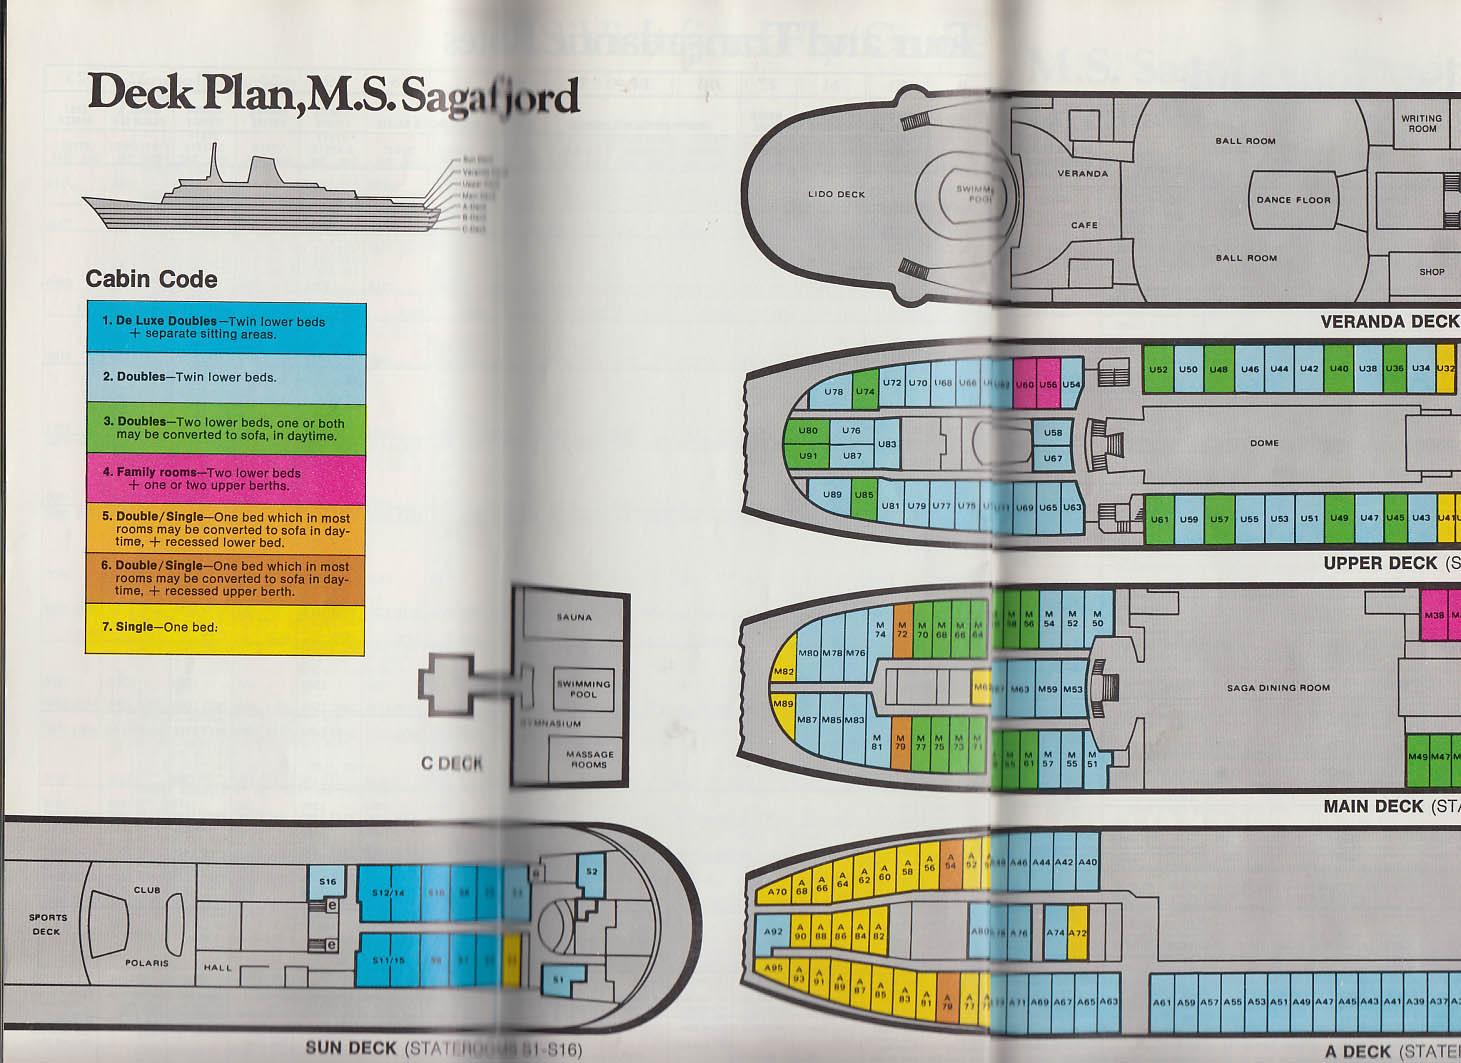 Norwegian America Lines M S Sagafjord Vistafjord Cruise Brochure 1977-1979